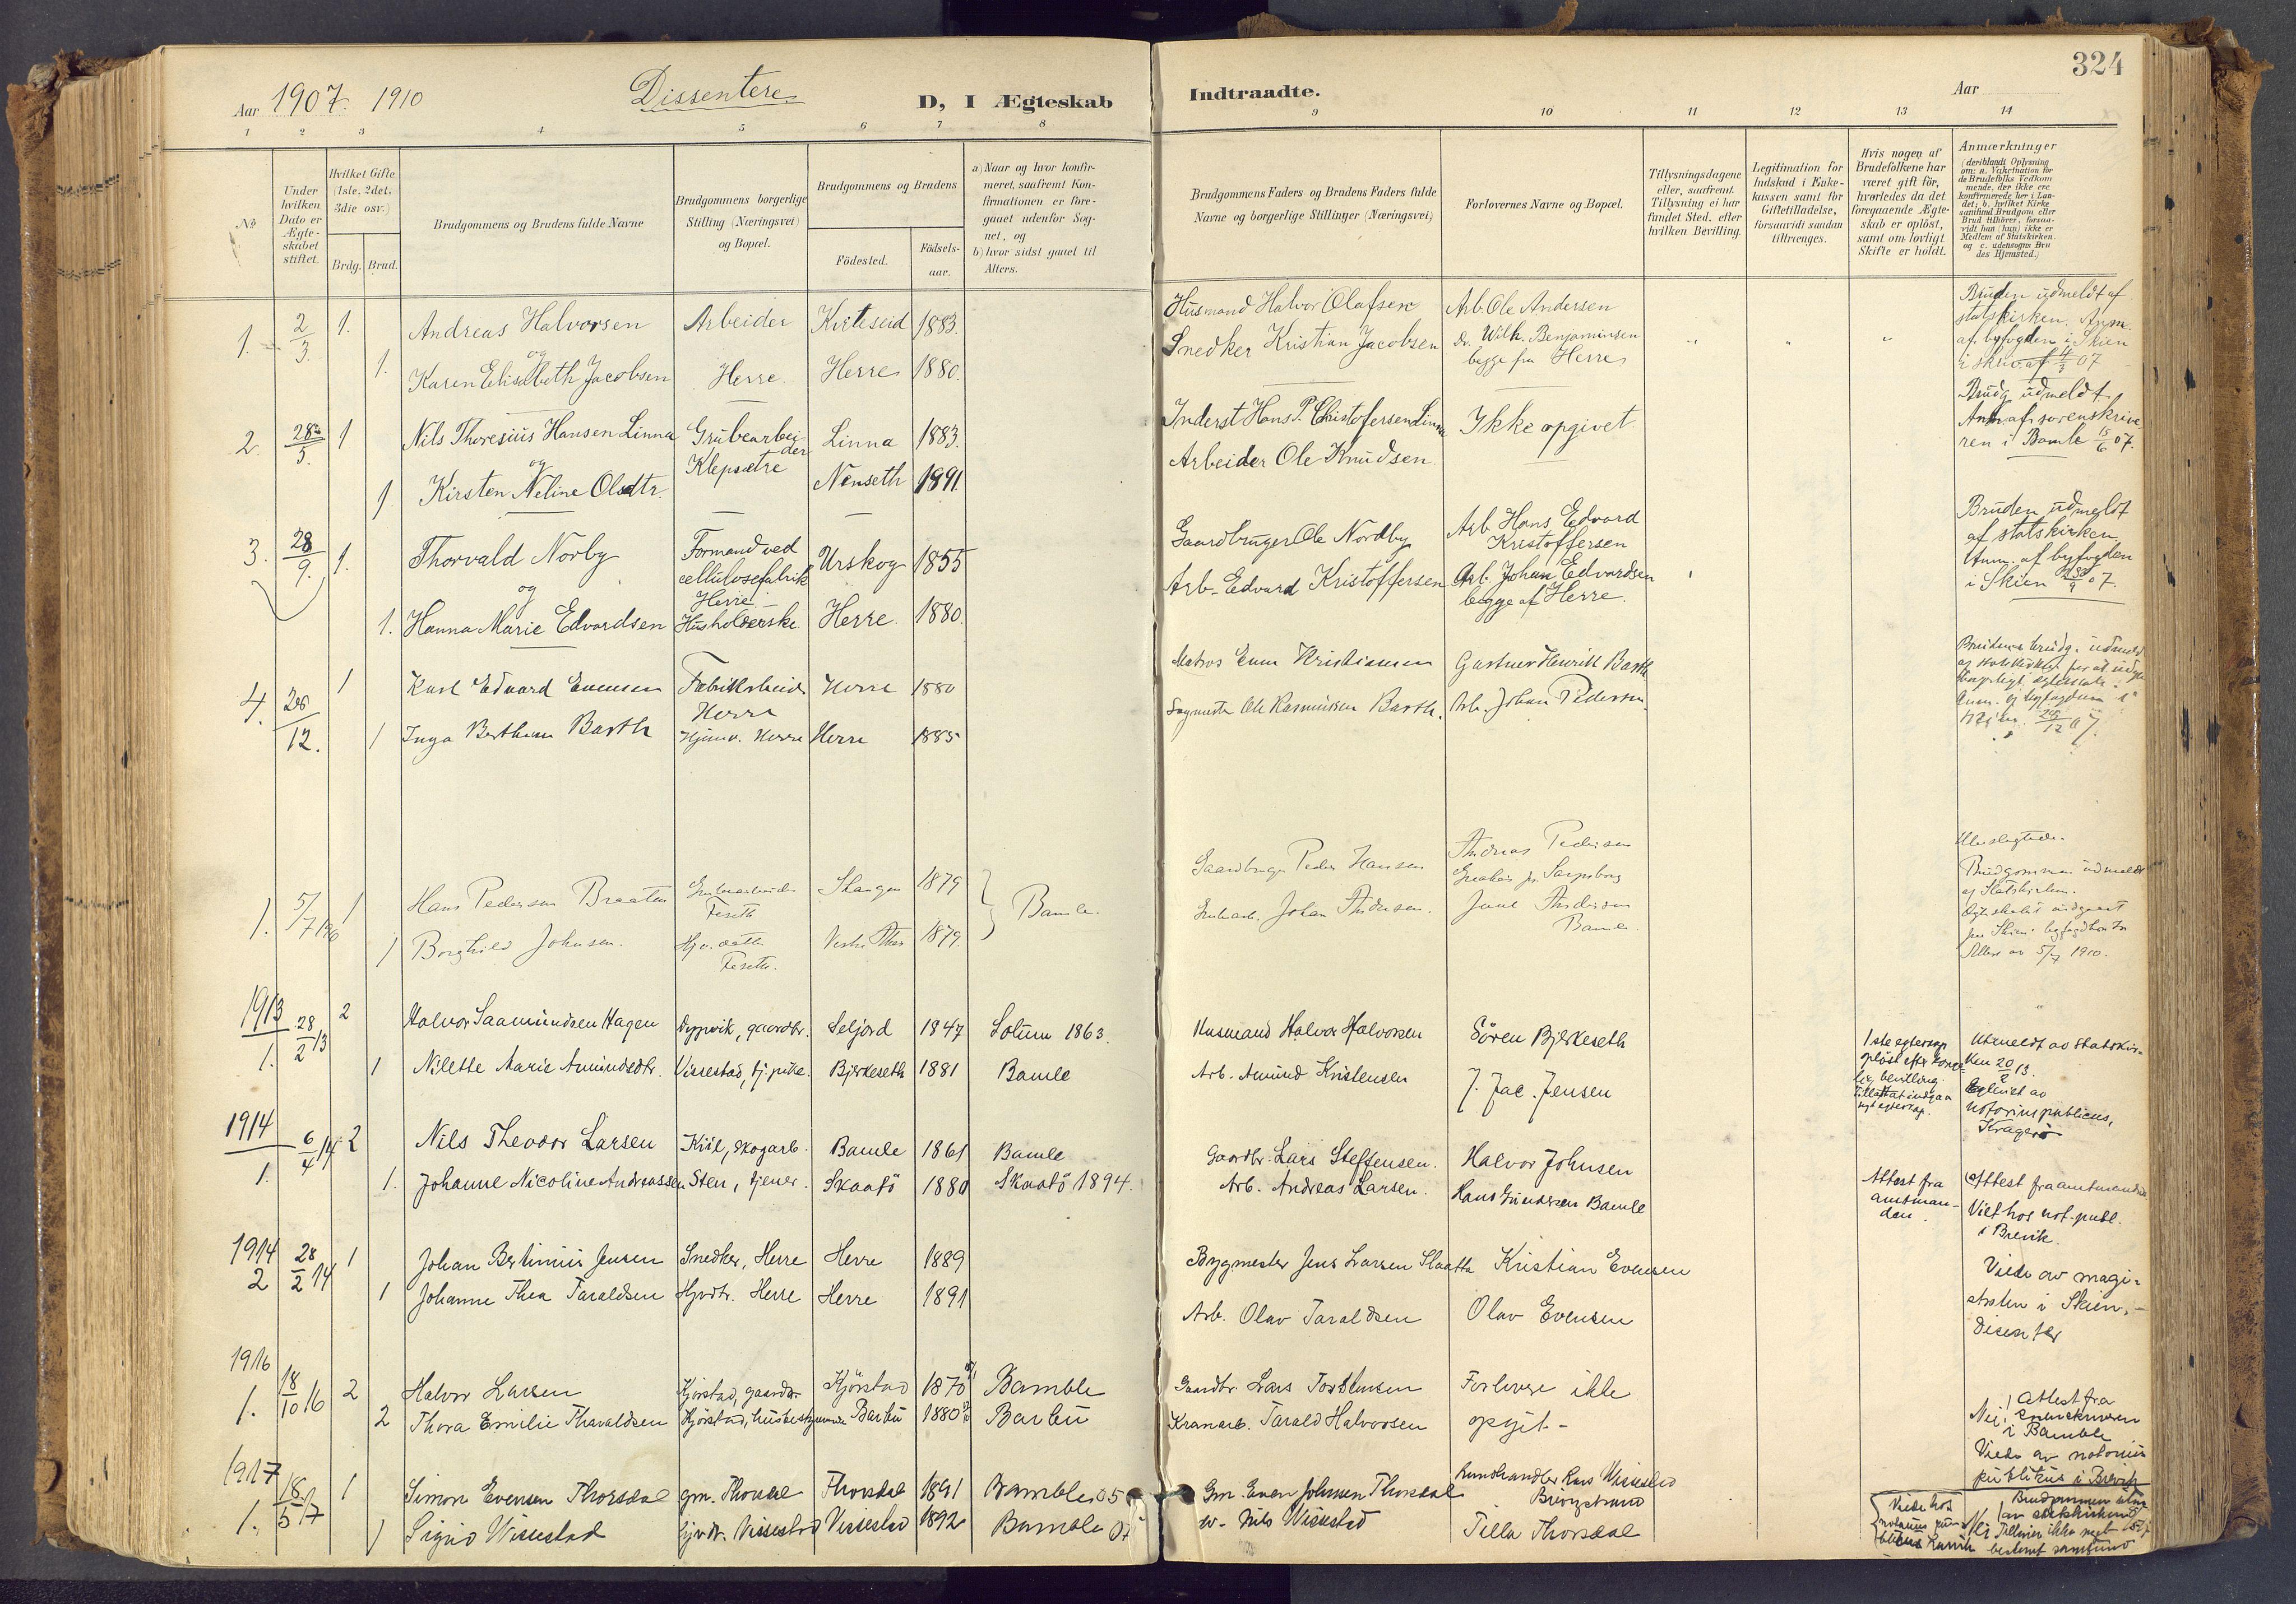 SAKO, Bamble kirkebøker, F/Fa/L0009: Ministerialbok nr. I 9, 1901-1917, s. 324